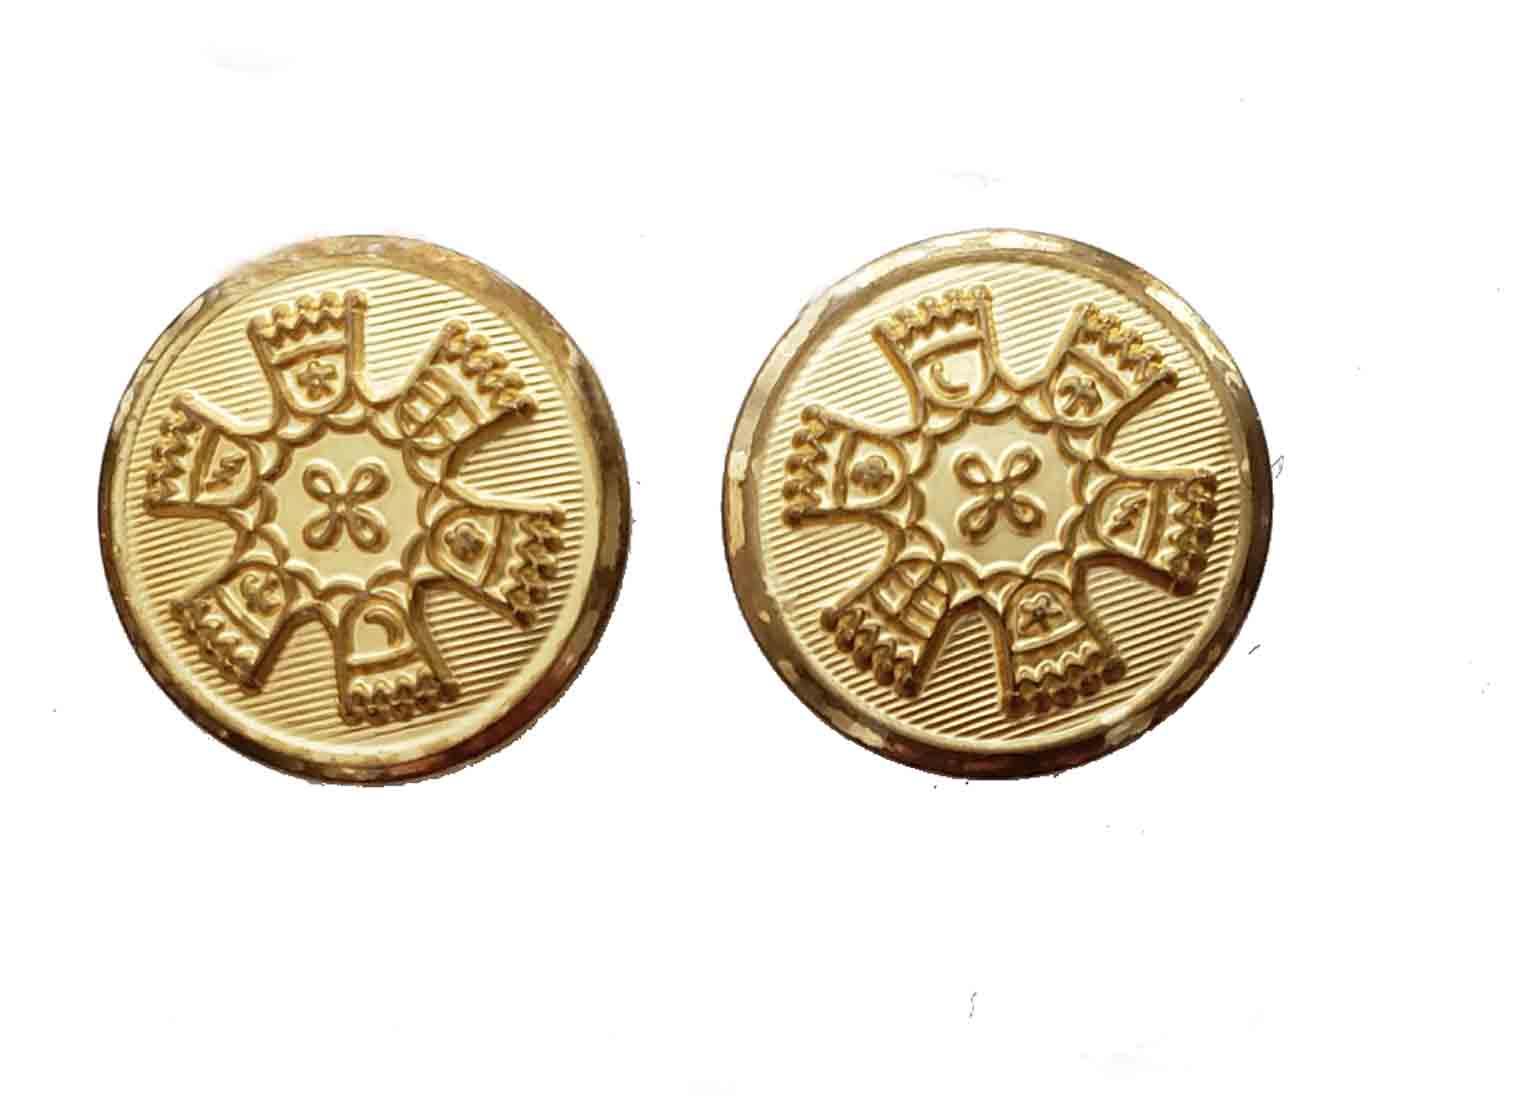 Two Vintage Waterbury Blazer Buttons Gold Shank Brass 1970s Men's